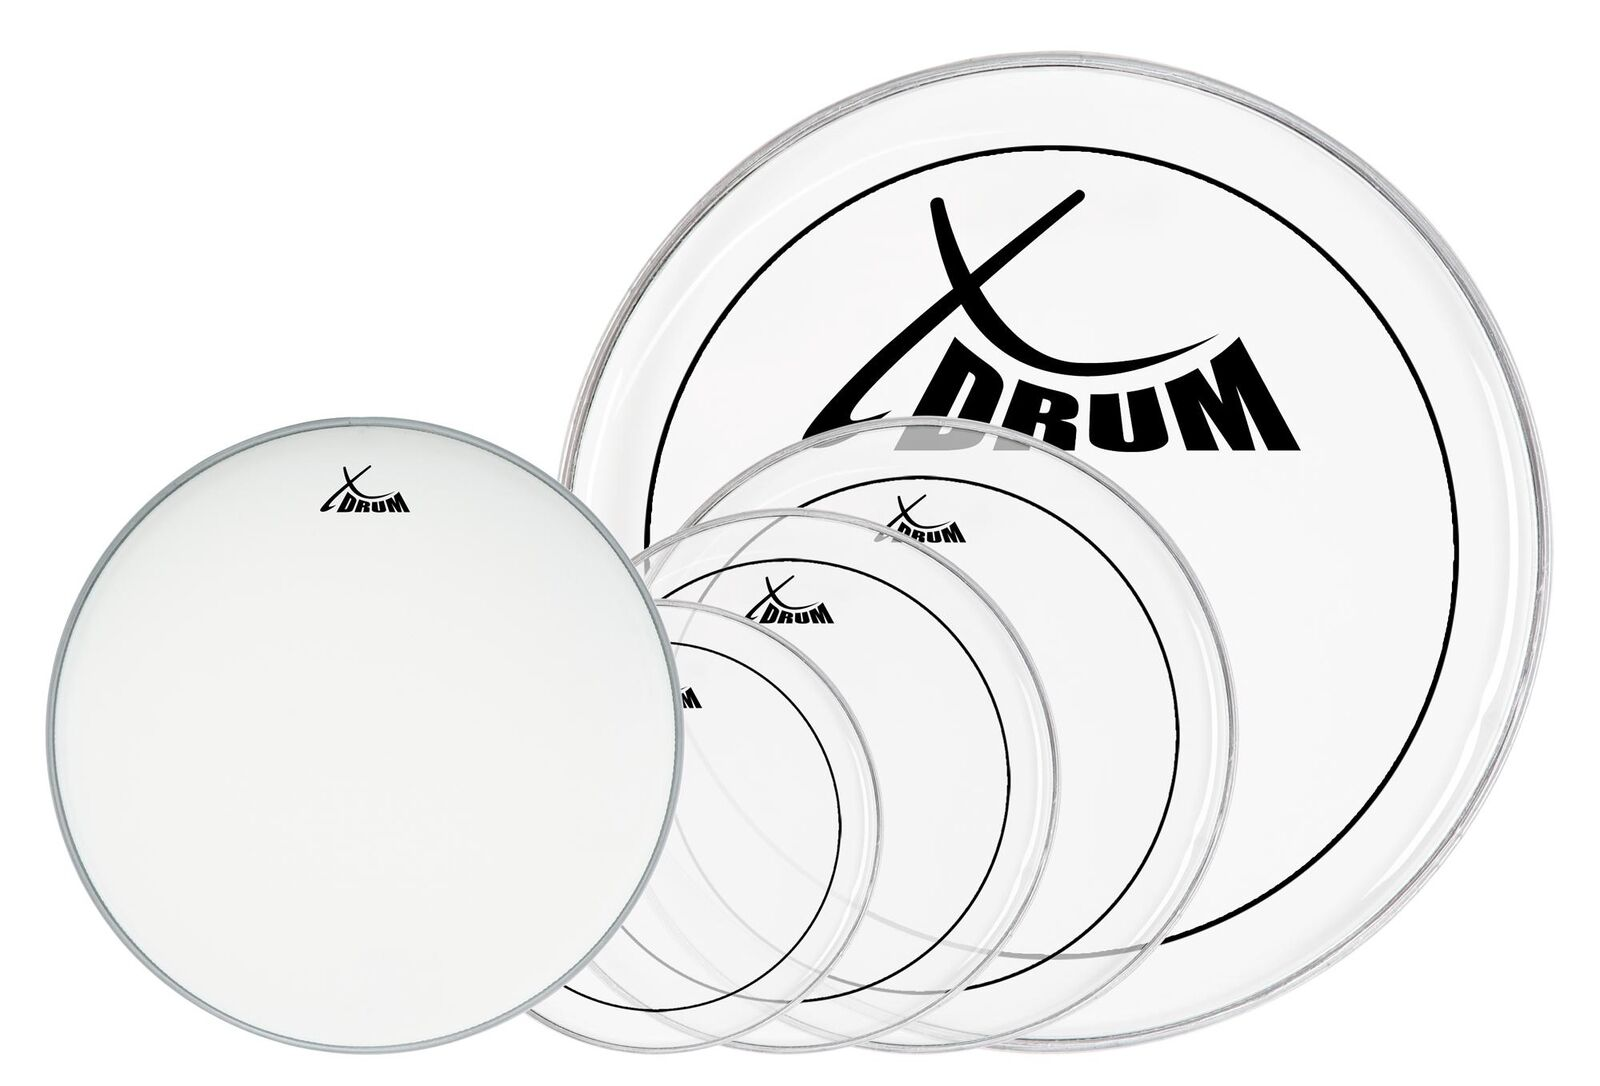 XDrum Session 10,12,14,22+14  kompl. Fellset Schlagzeug